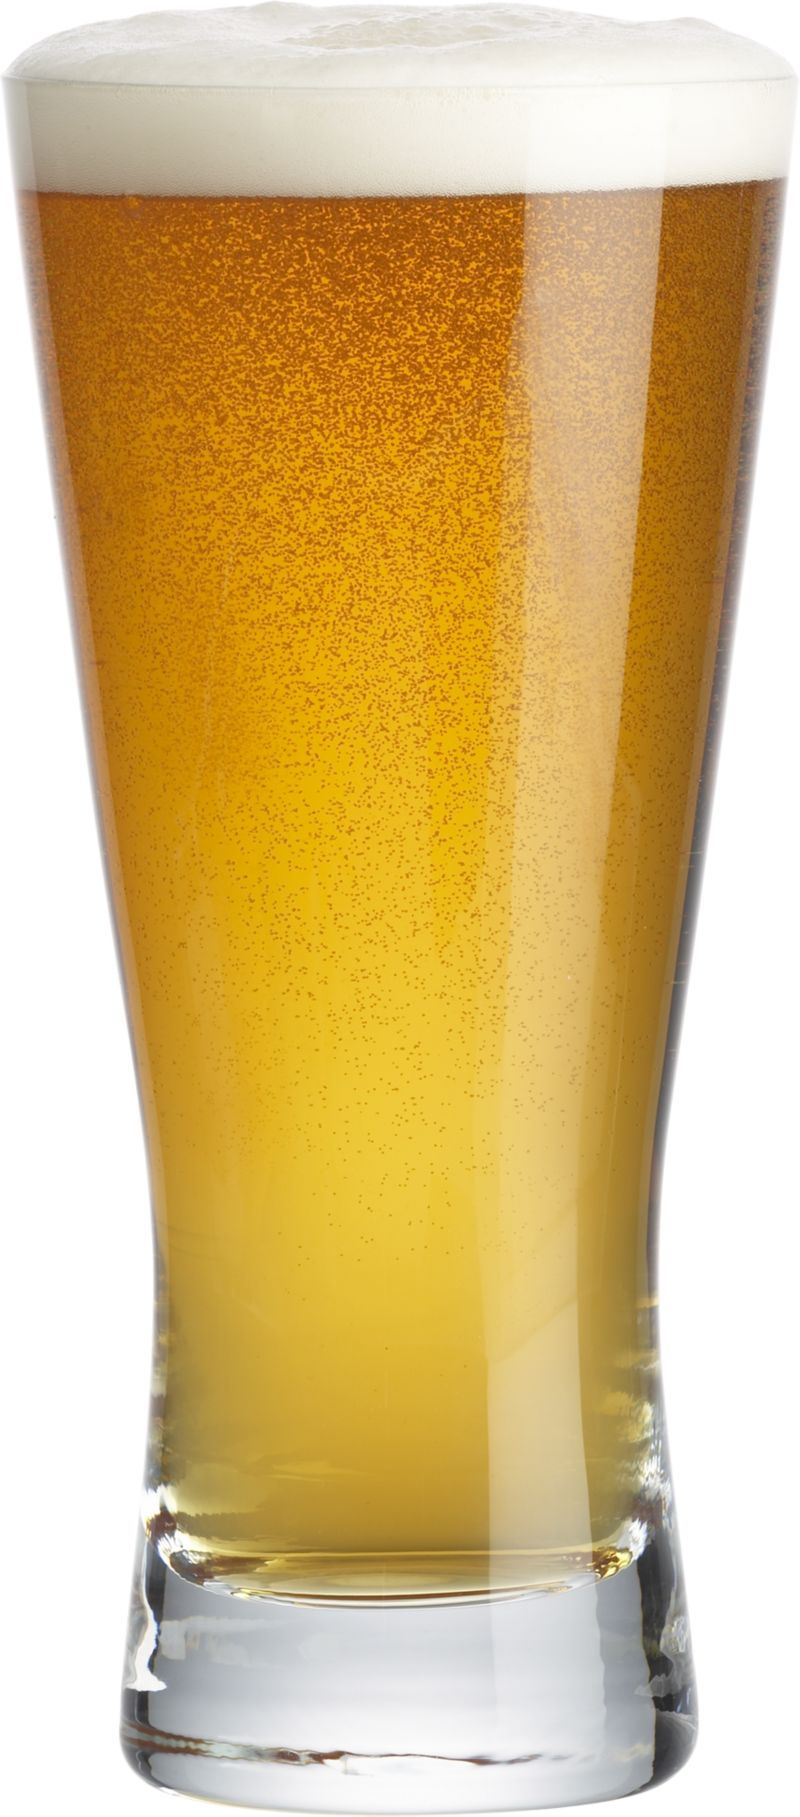 Portland 22 Oz. Beer Glass Crate And Barrel Wishlist